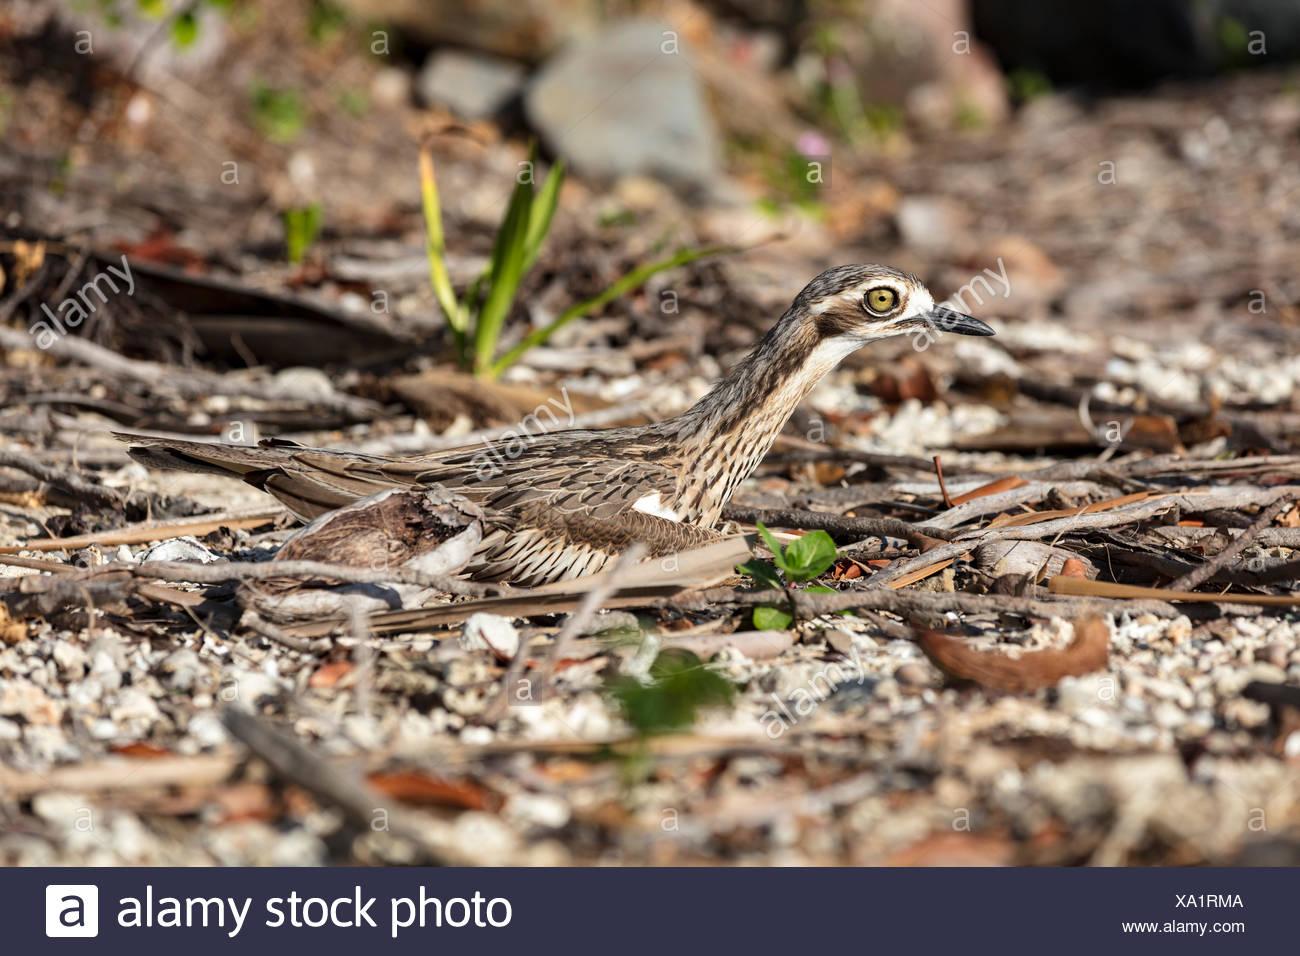 Bush stone-curlews (Burhinus grallarius) in crouched position, endemic beach bird, Whitsundays, Queensland, Australia Stock Photo